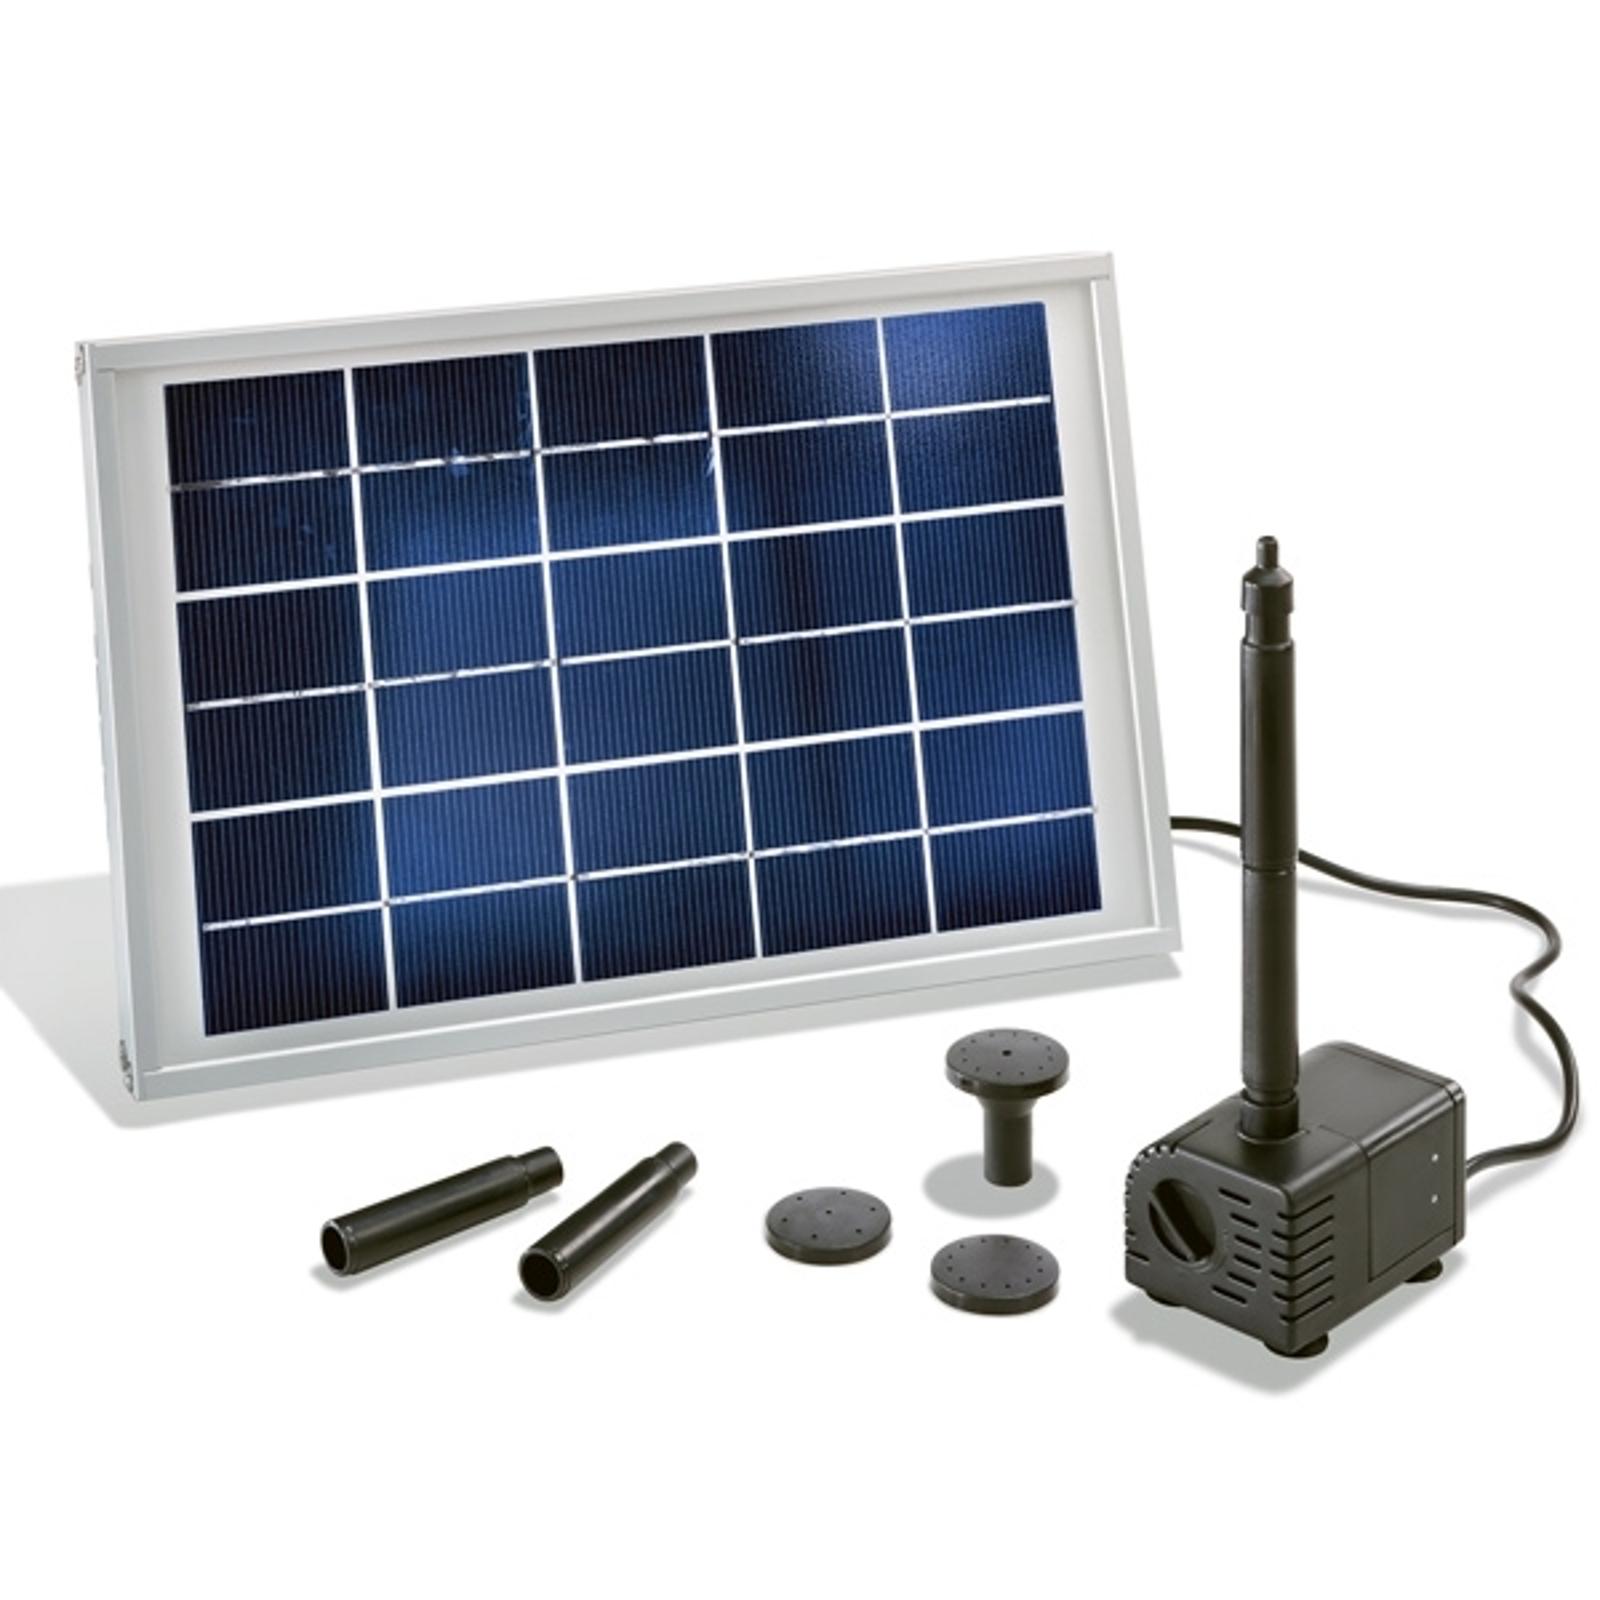 Solar pump system Siena_3012103_1